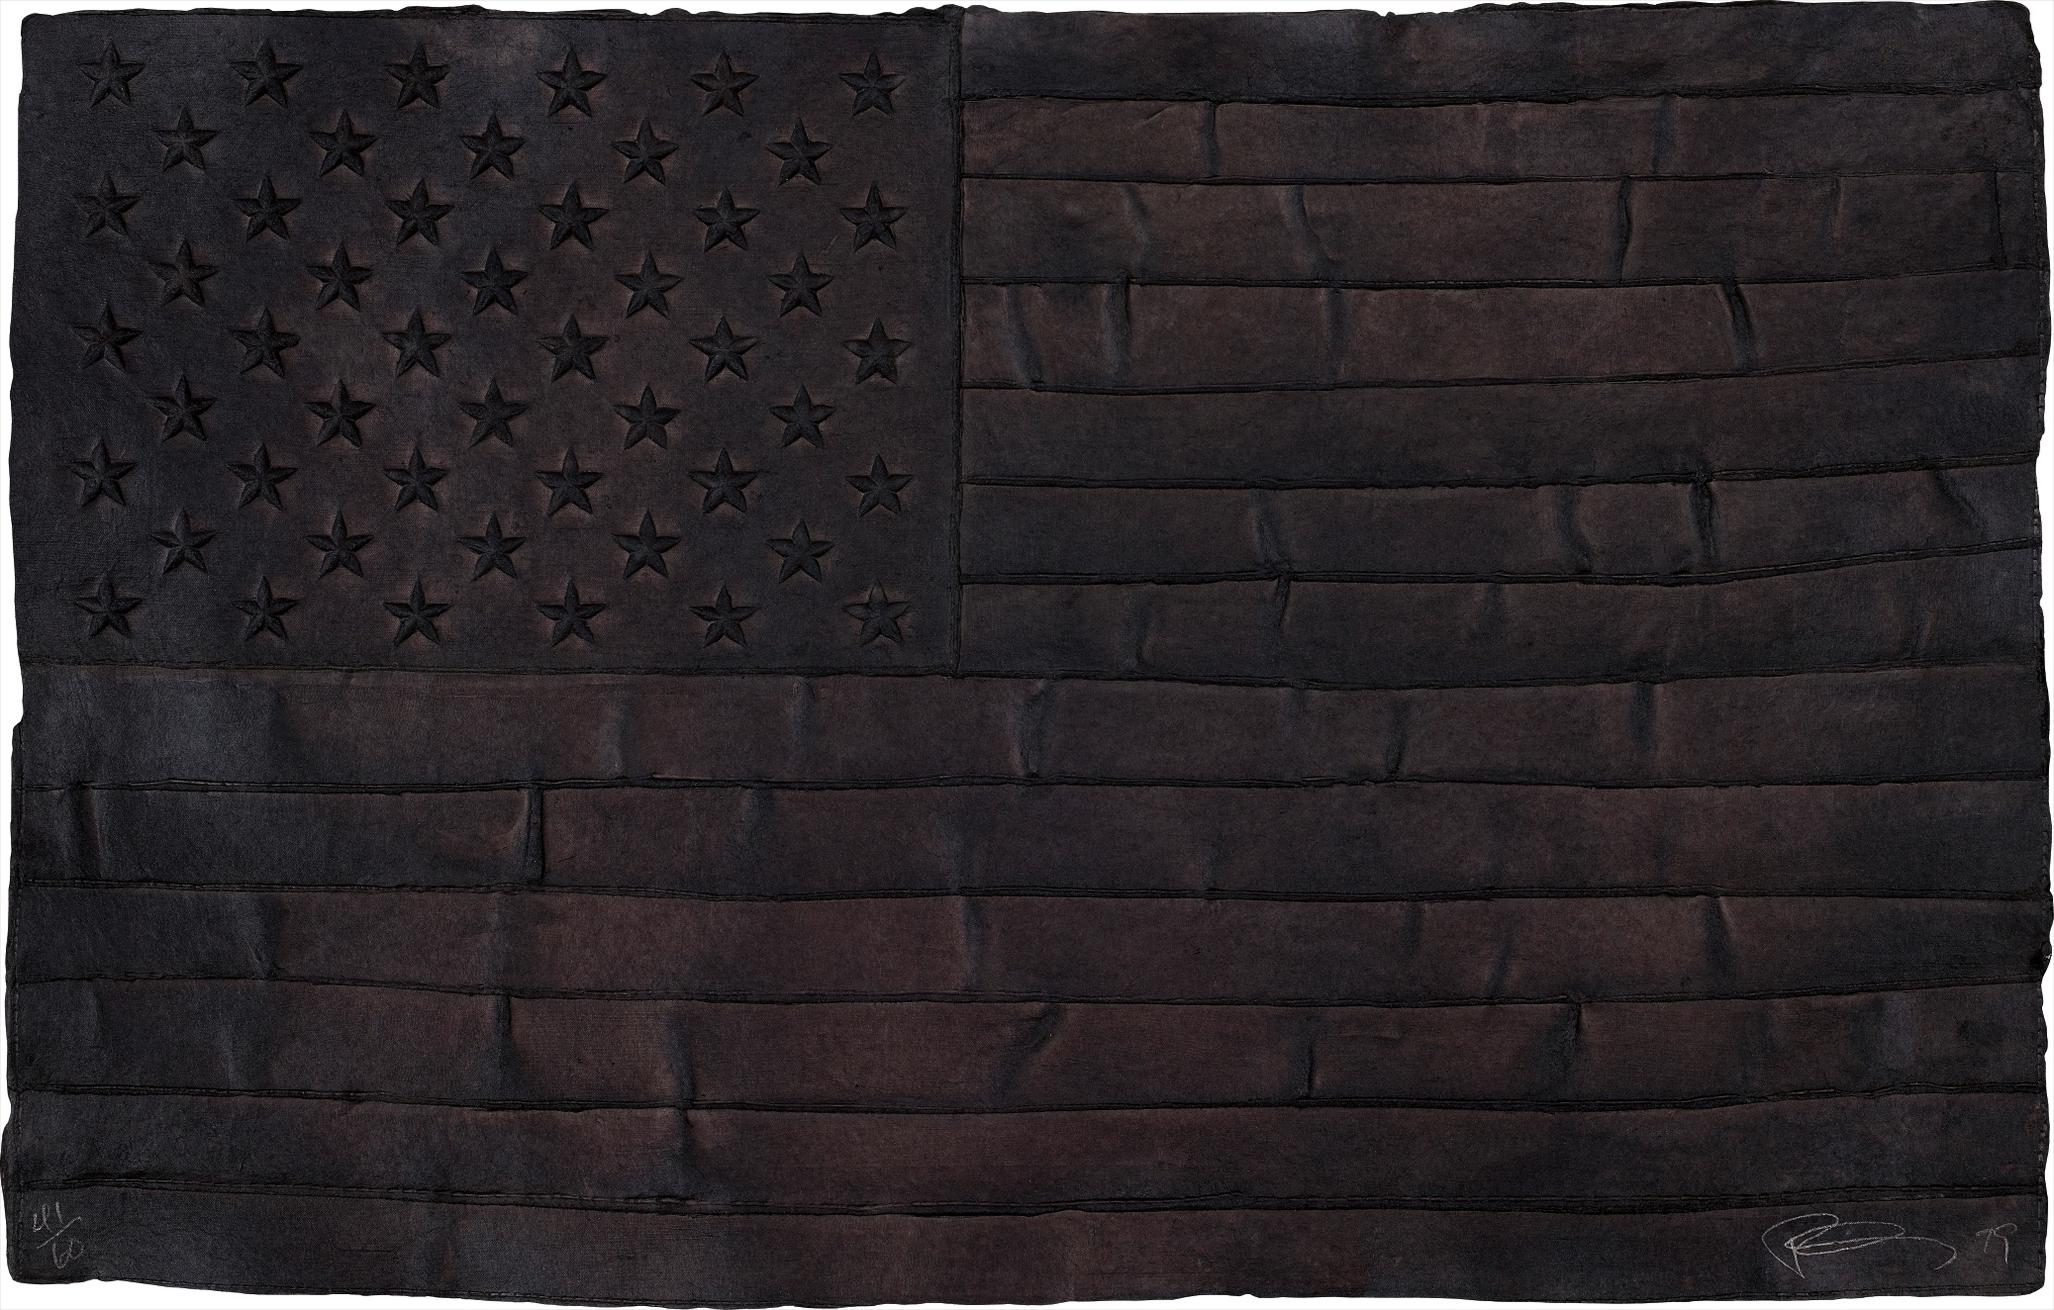 Robert Longo-Black Flag-1999